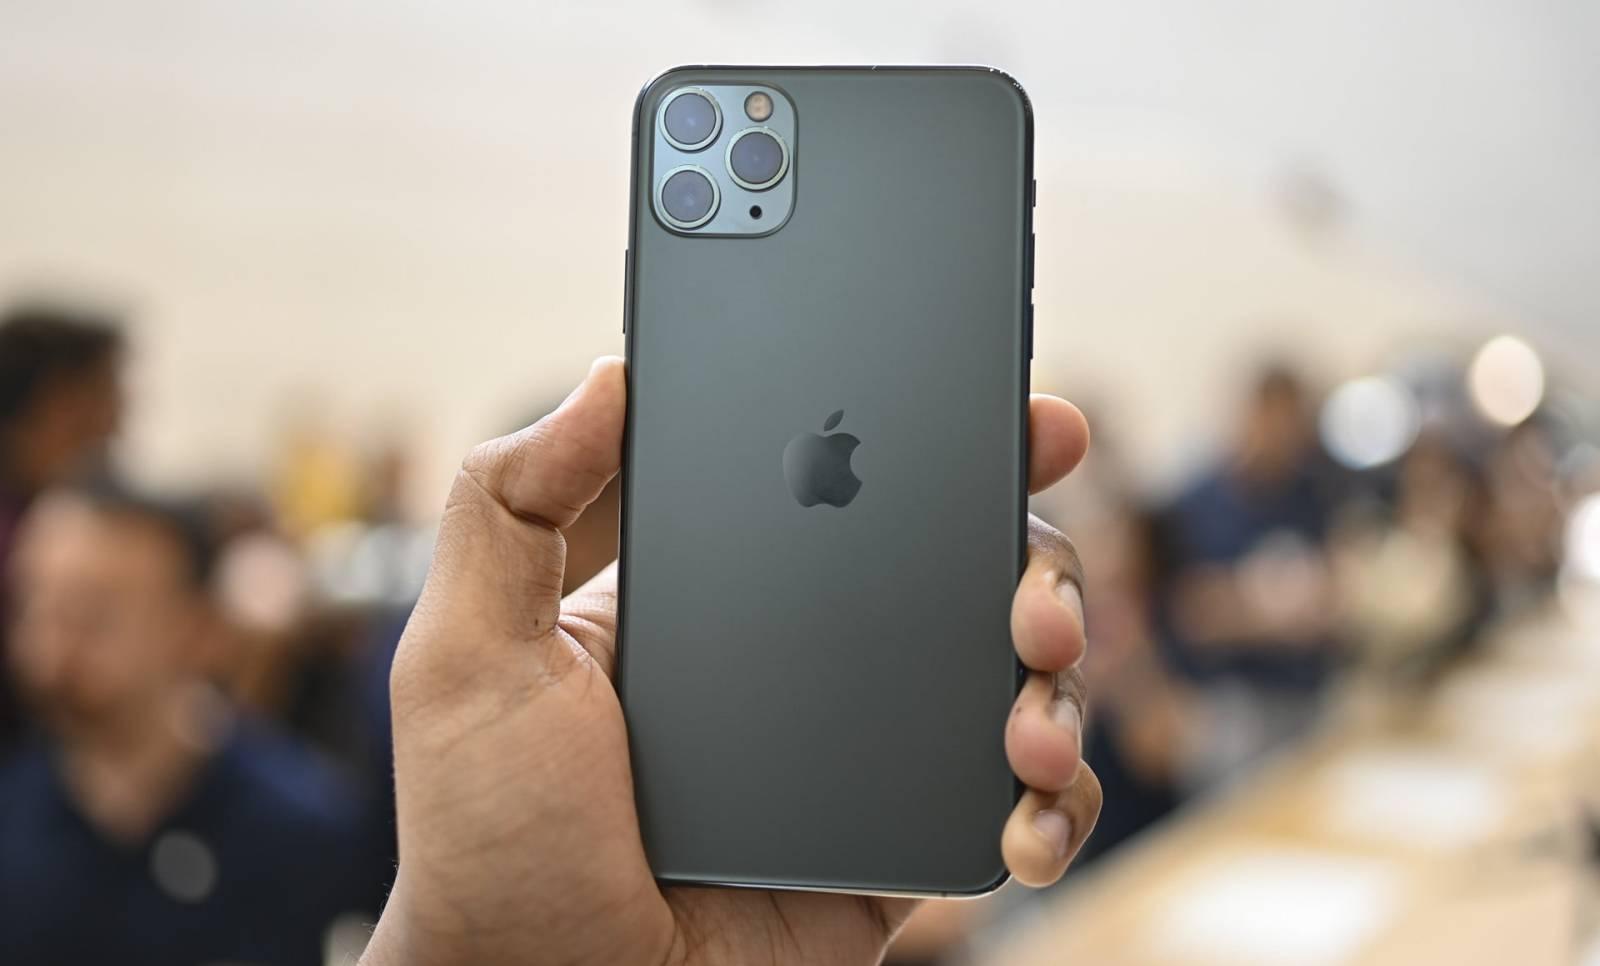 eMAG IEFTINESTE CU MULT Seria iPhone 11, UITA de Comenzile FACUTE!